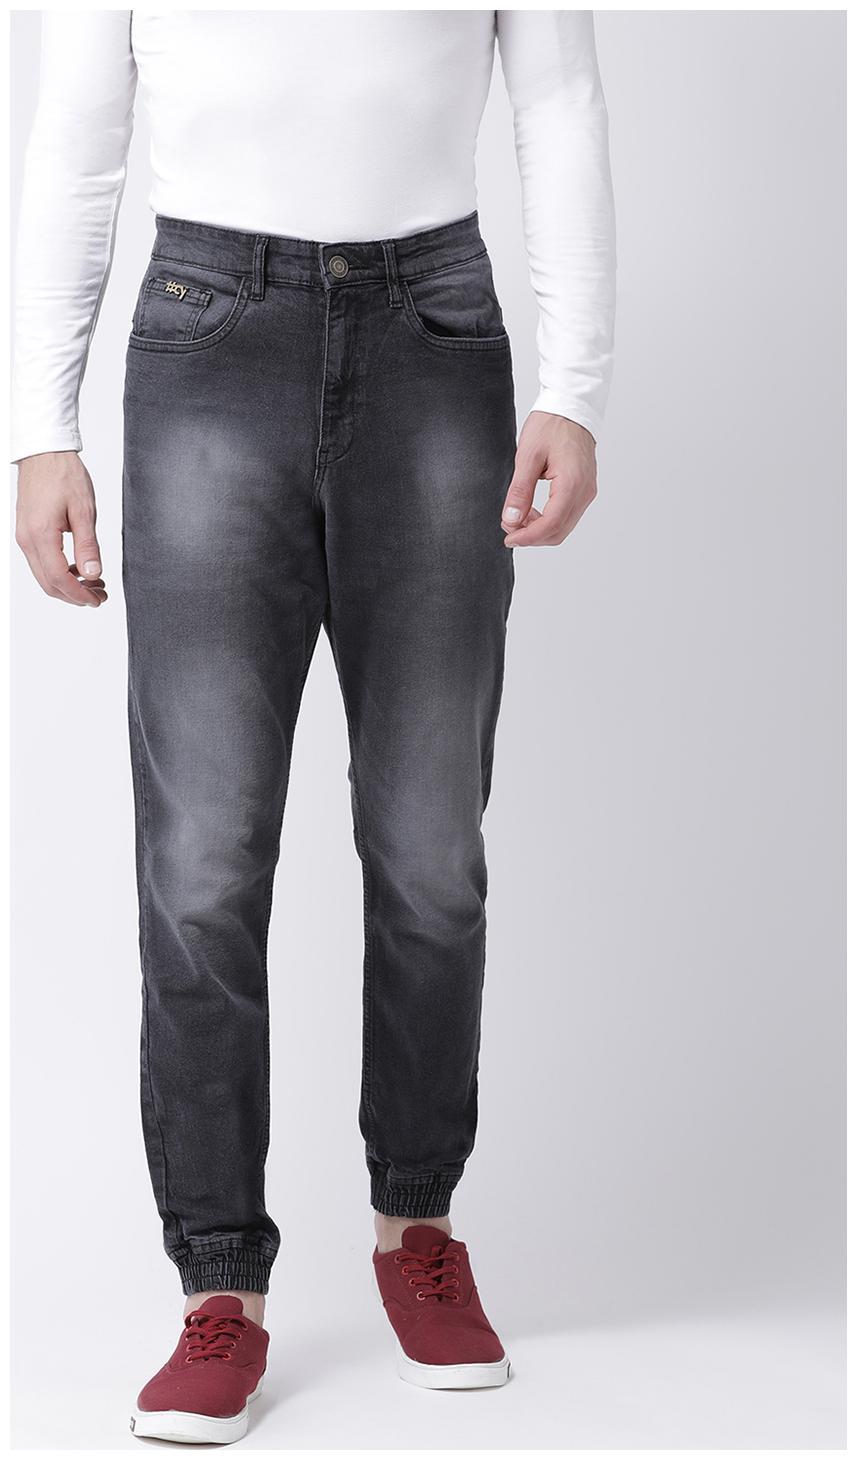 CLUB YORK Men Black Slim Fit Jeans by Club York